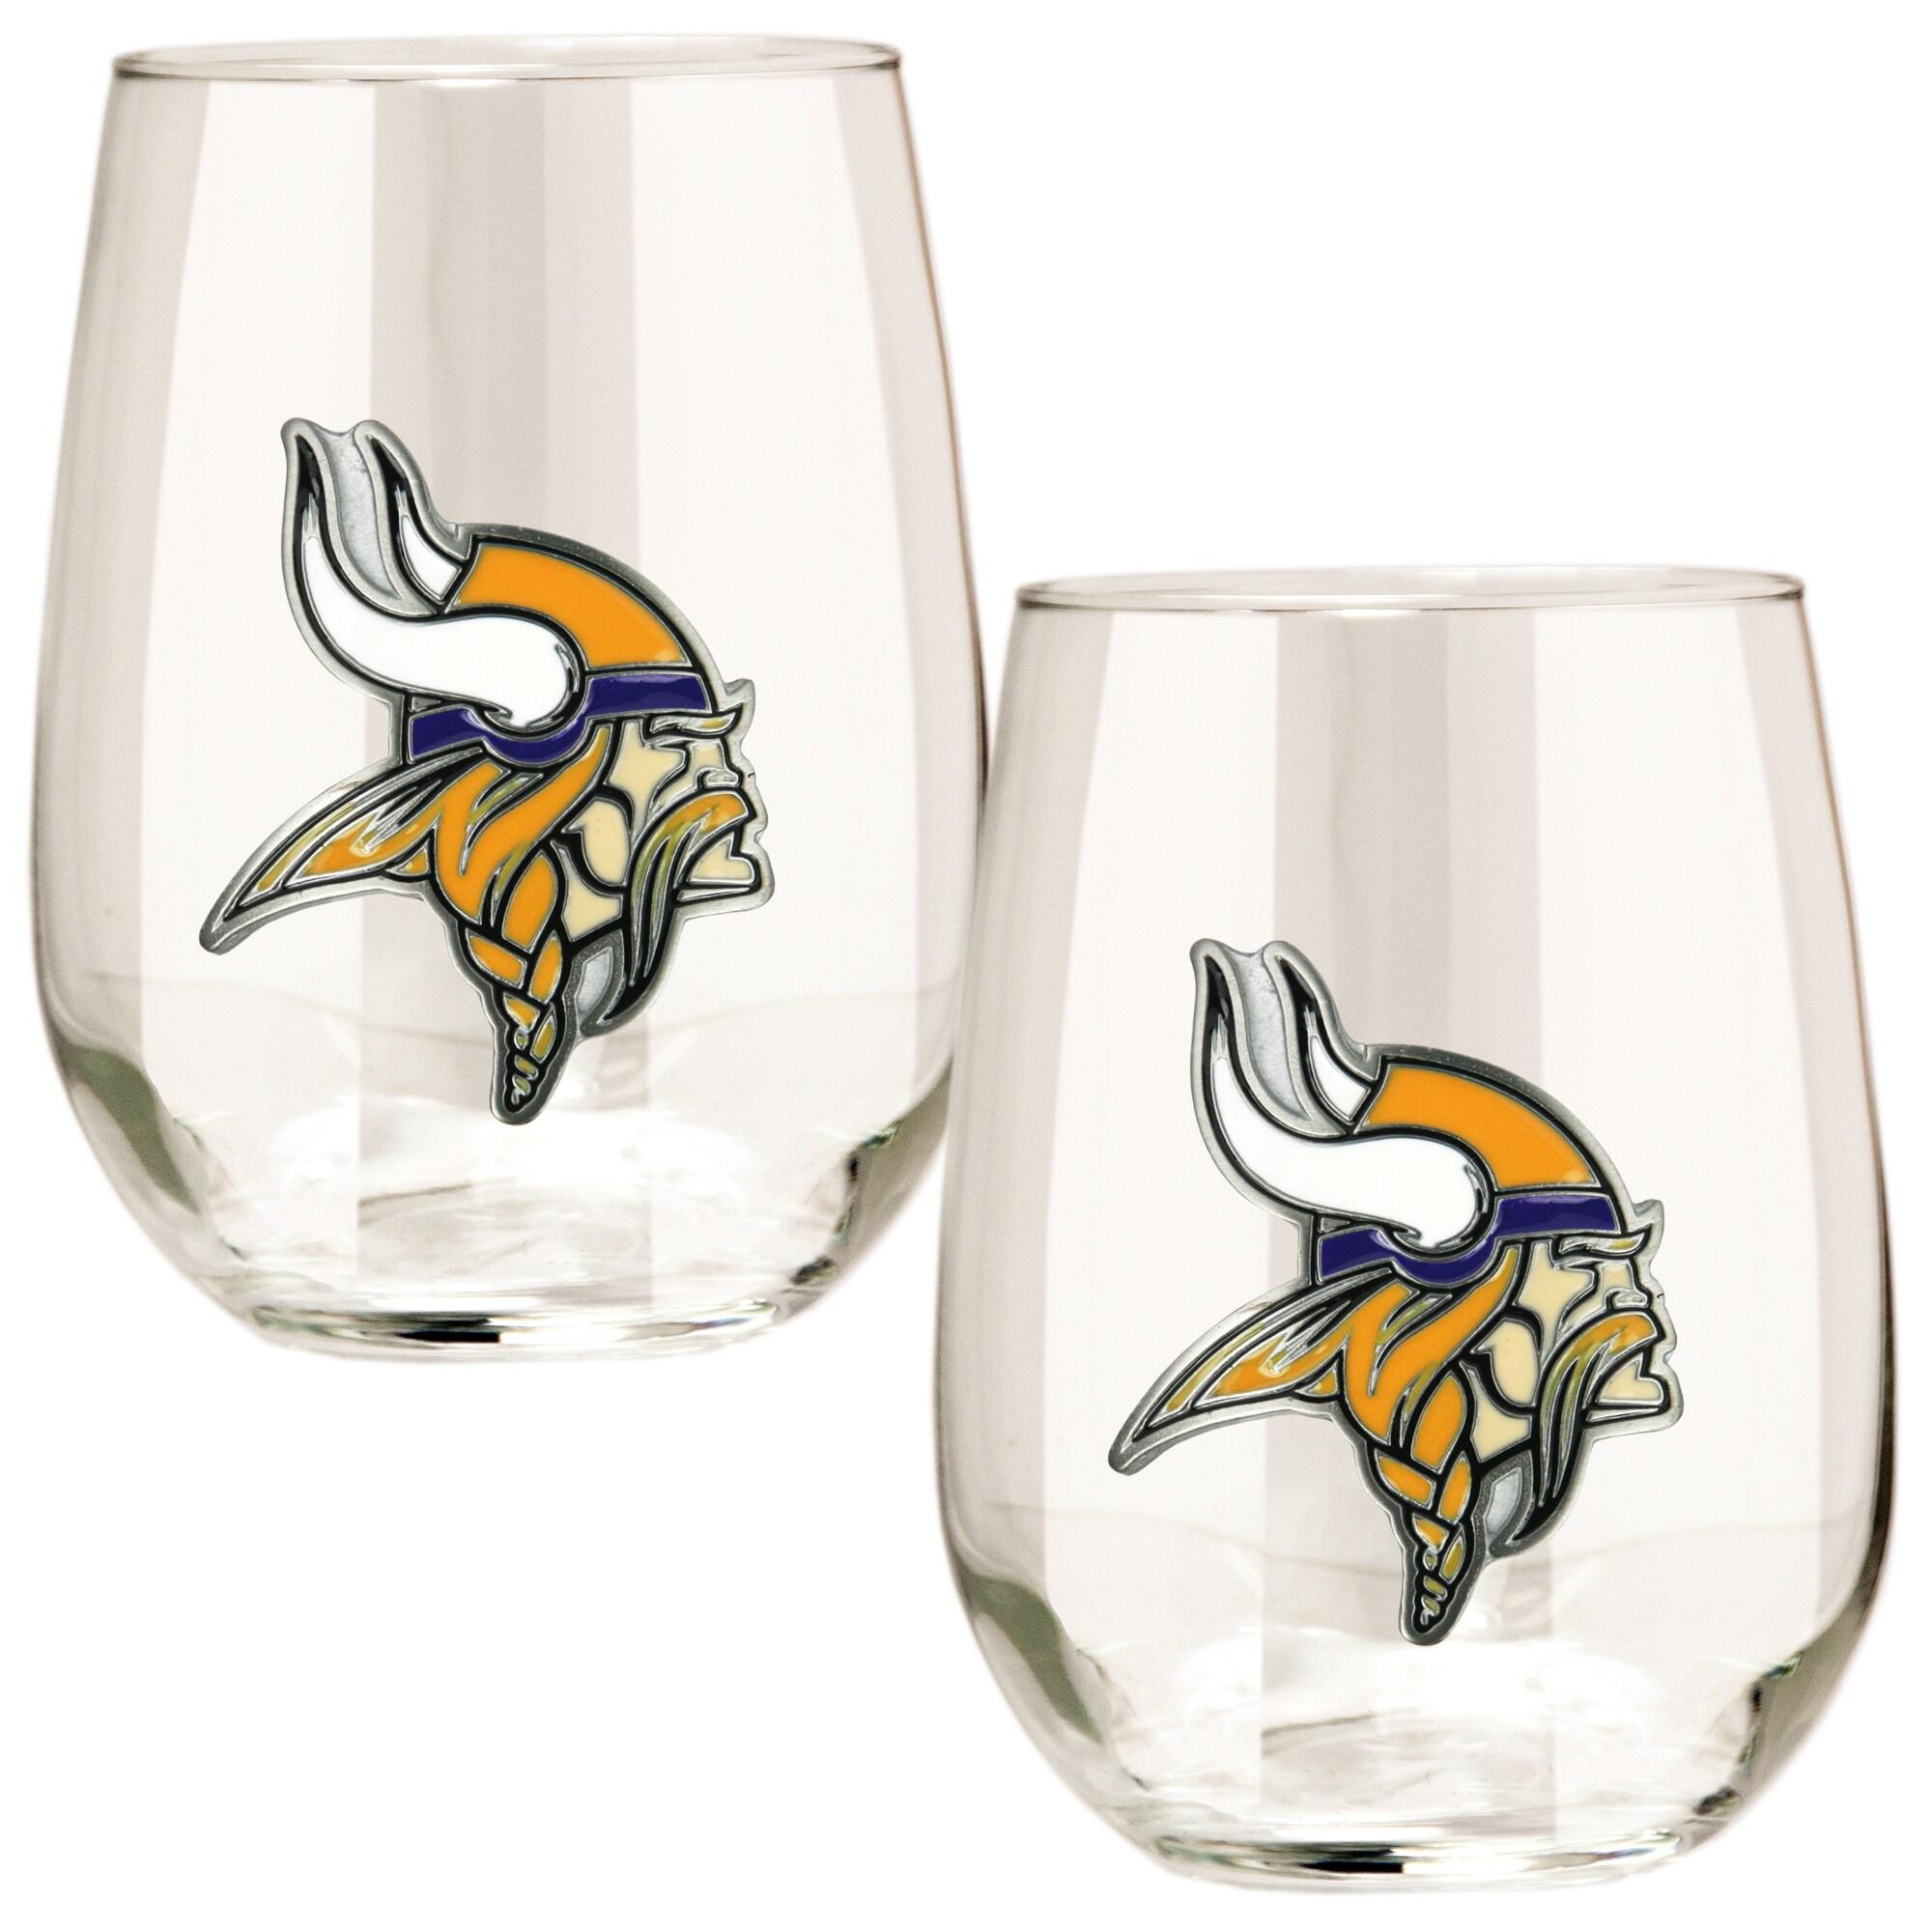 Minnesota Vikings 15oz. Stemless Wine Glass Set